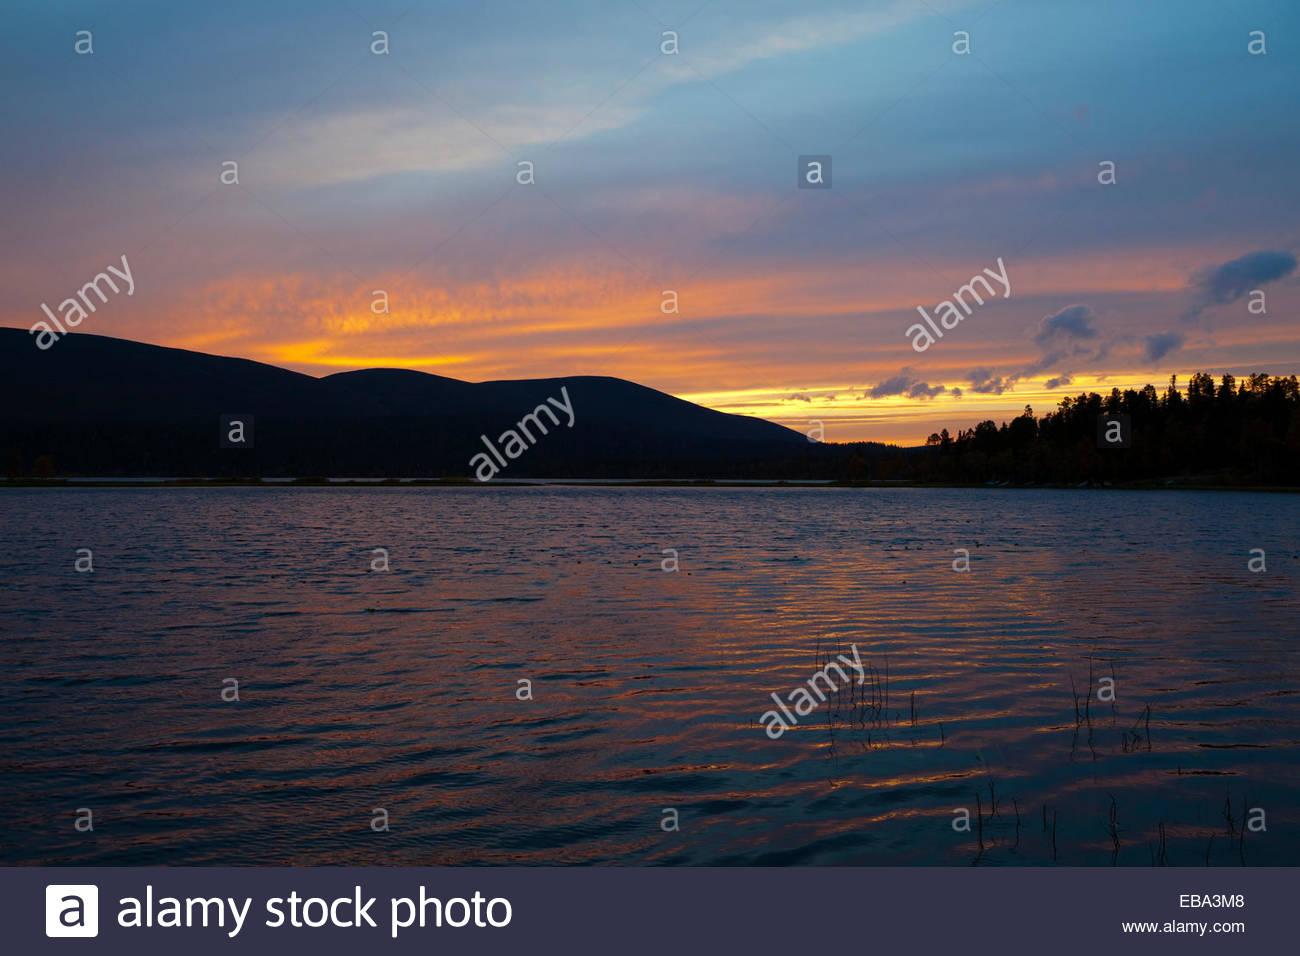 Red sunset at lake Vuontisjärvi in Lapland - Stock Image